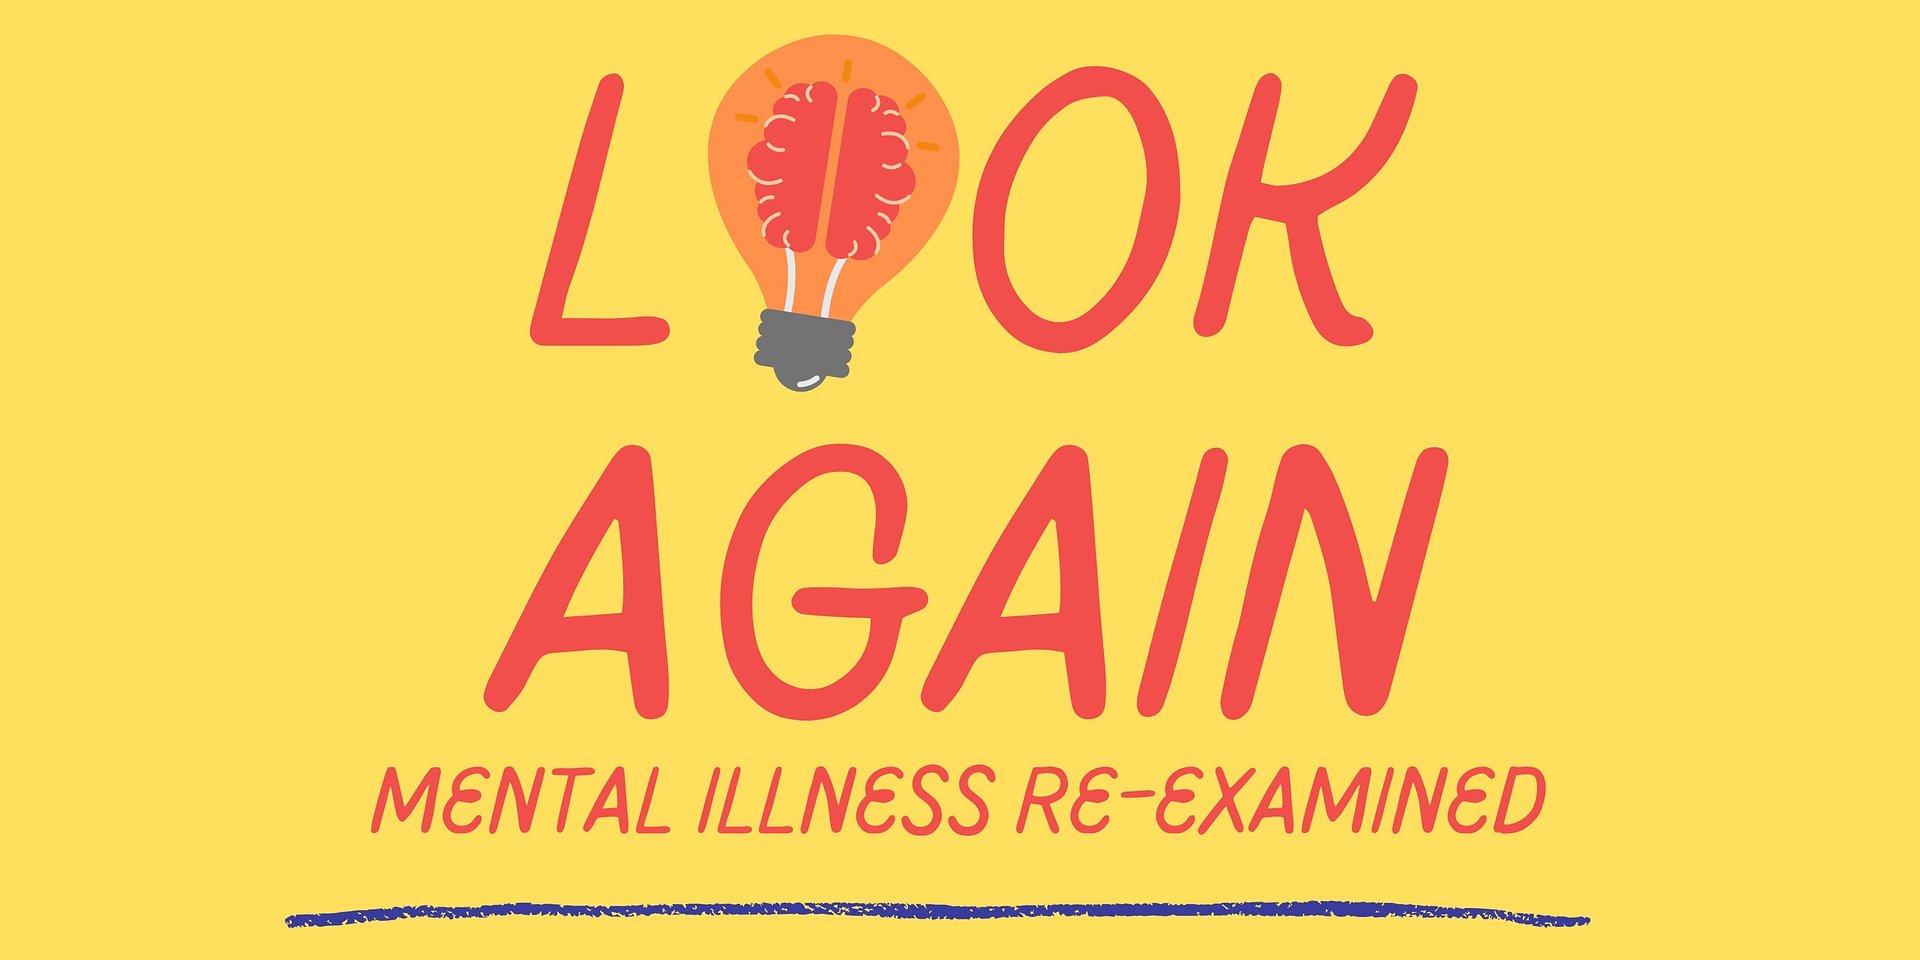 Let's expand the mental illness conversation.